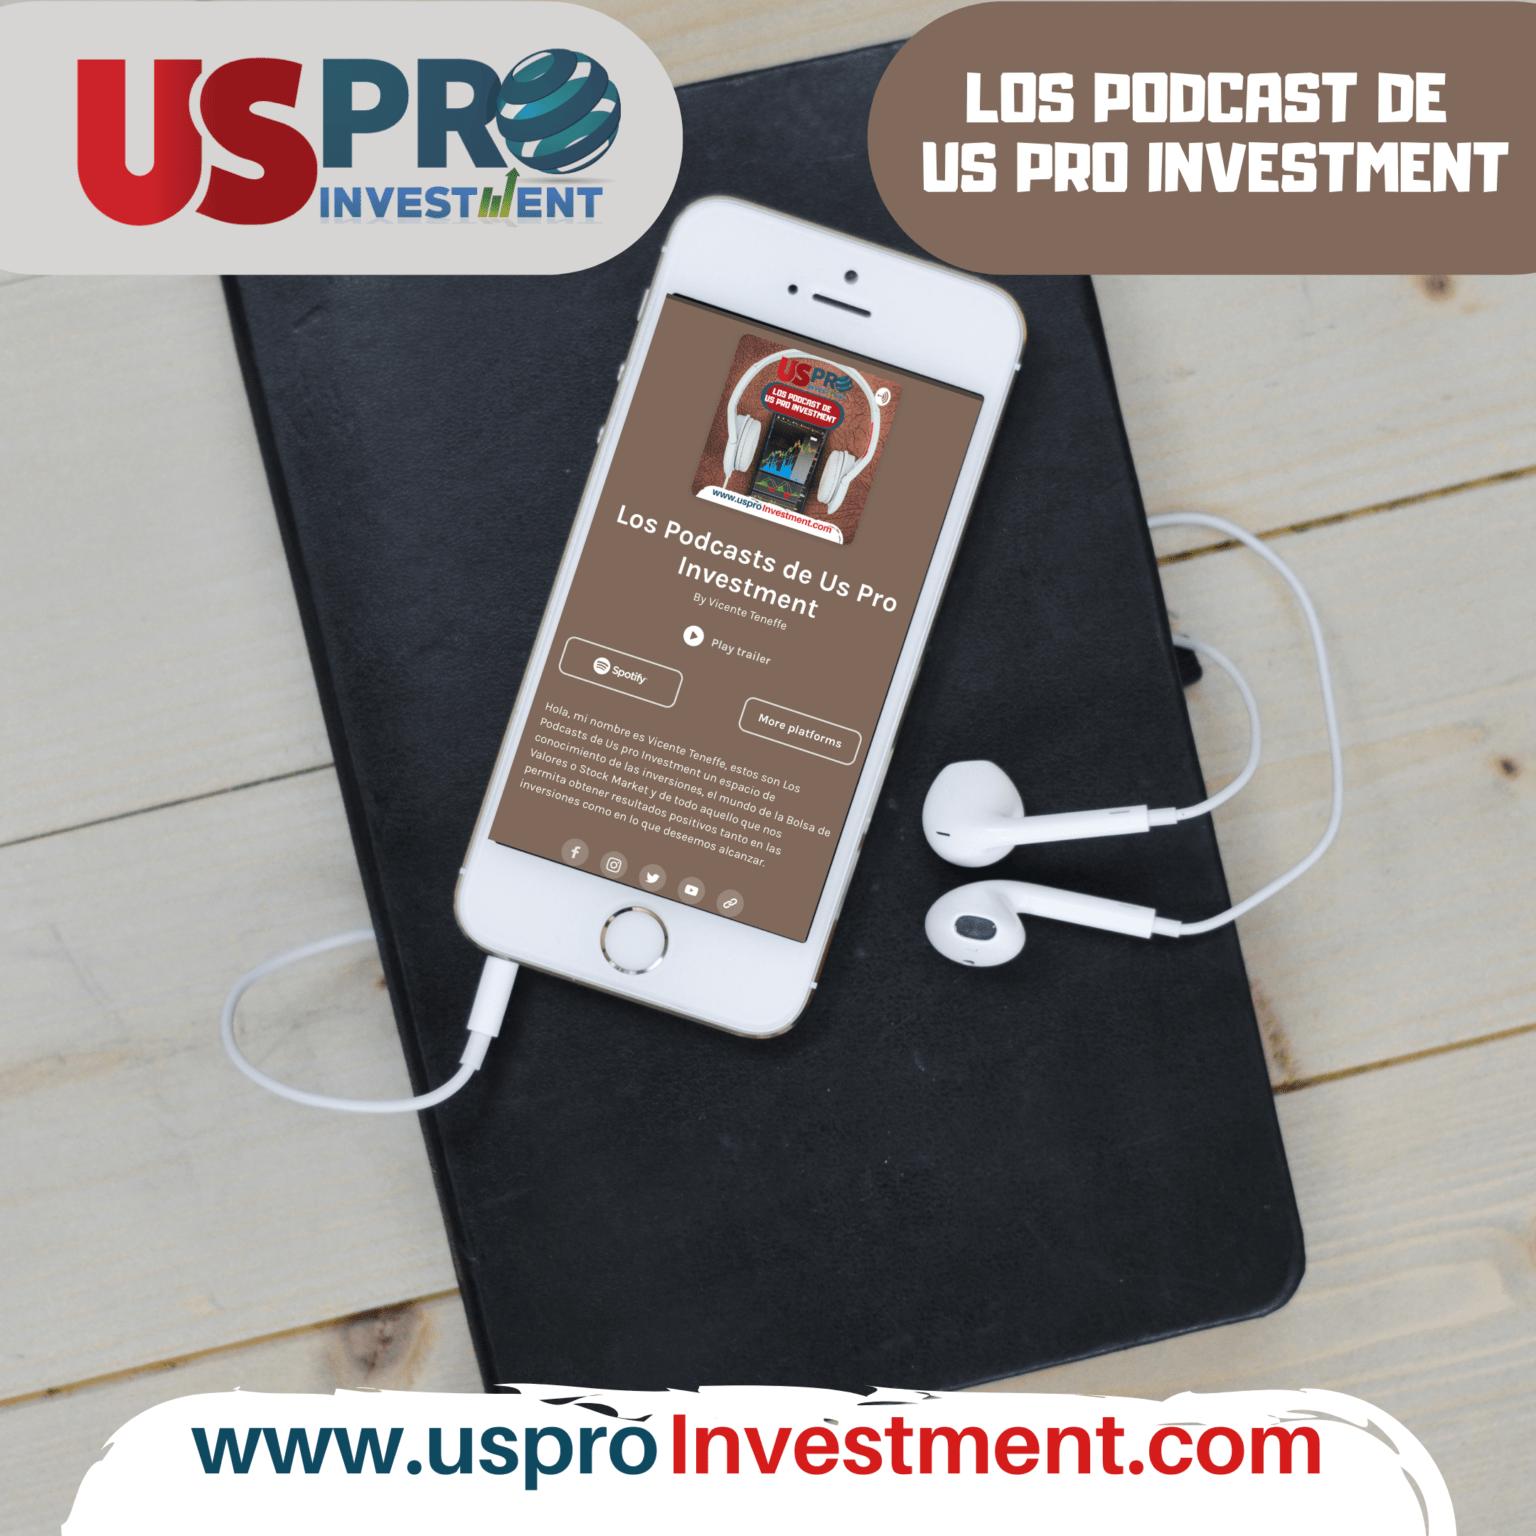 Los Podcasts de Us Pro Investment